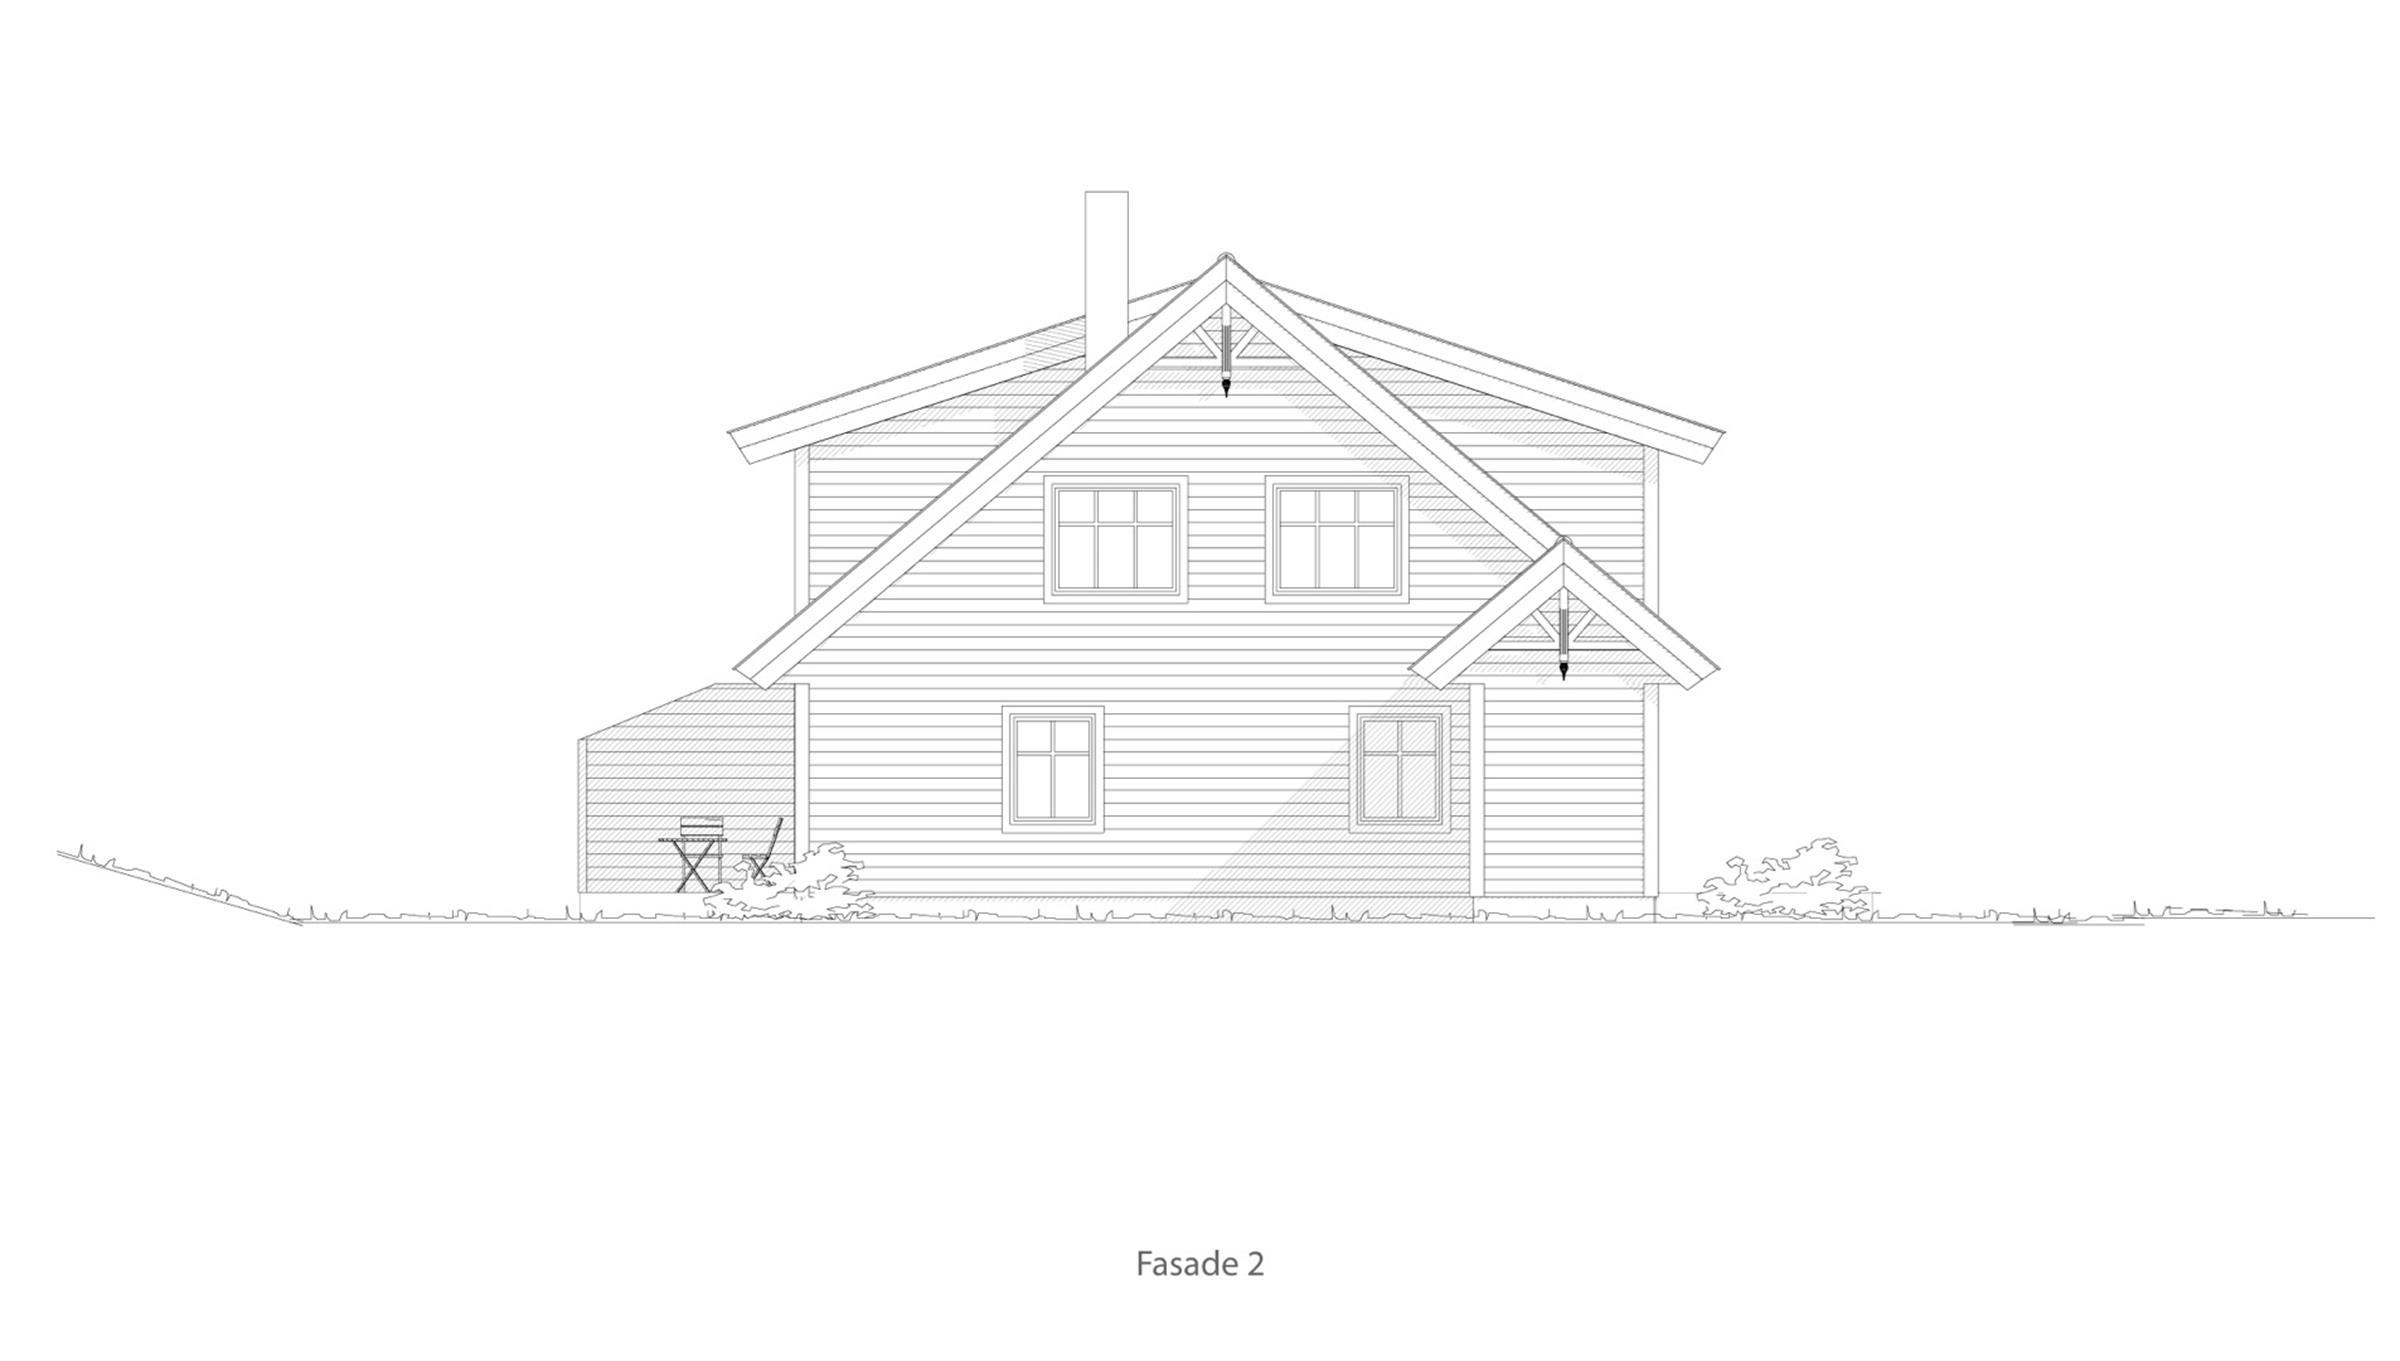 Elverum fasade 2